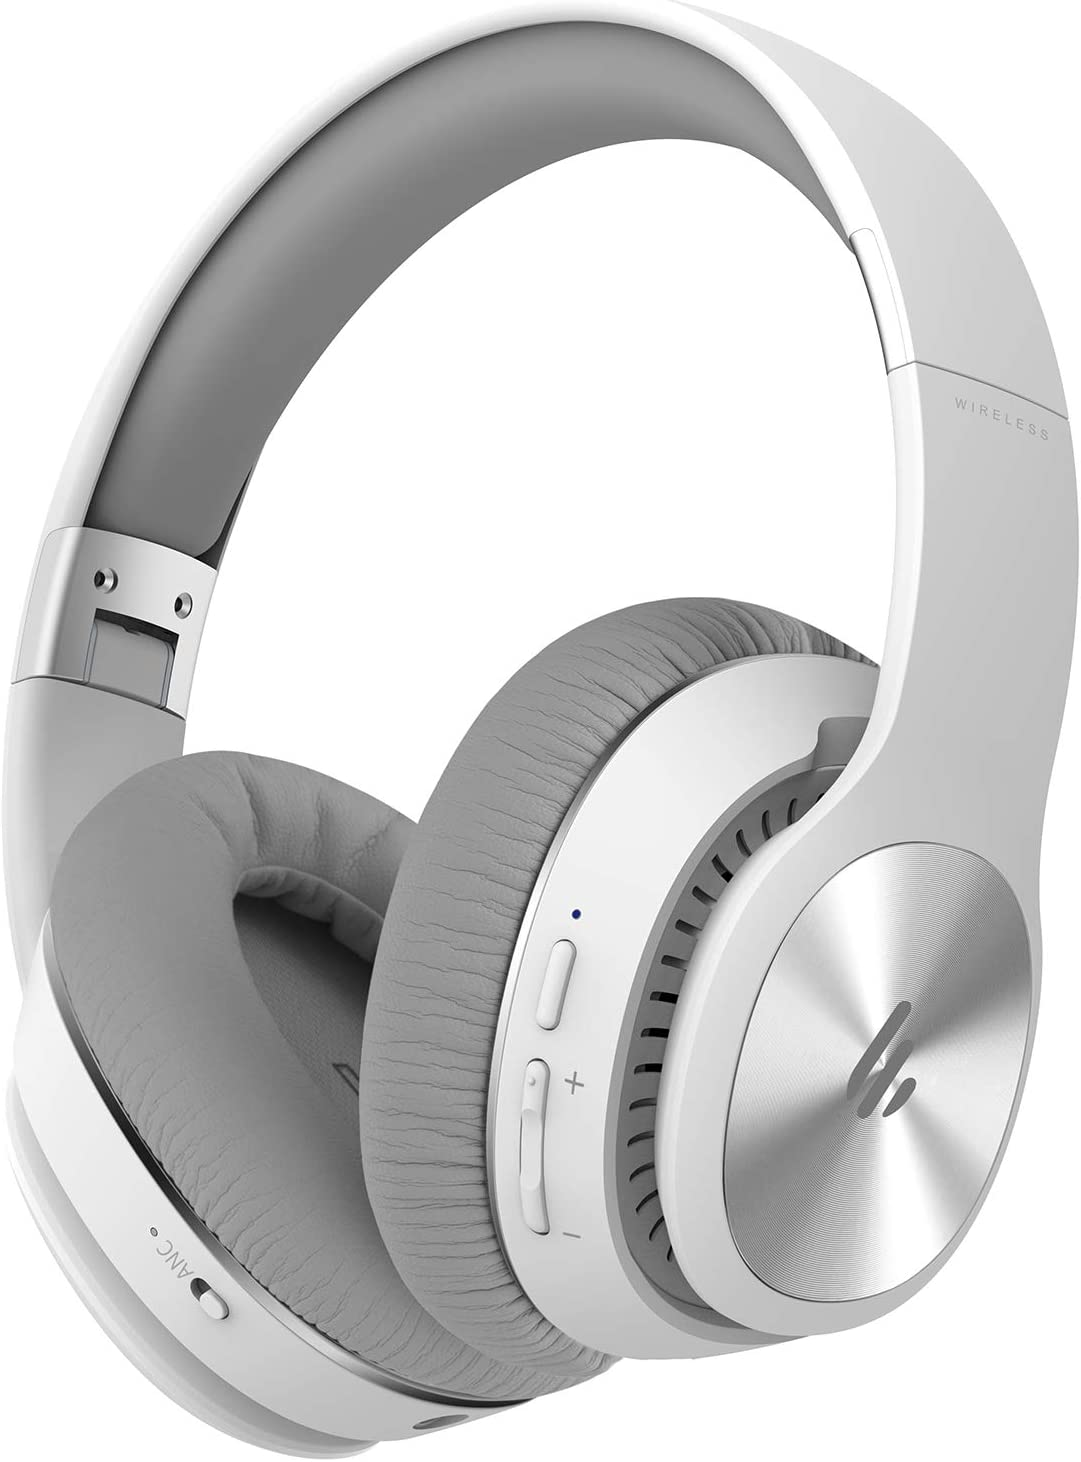 Edifier W828NB Wireless Bluetooth Headphones - Ergonomic, Active Noise Canceling (ANC) - White